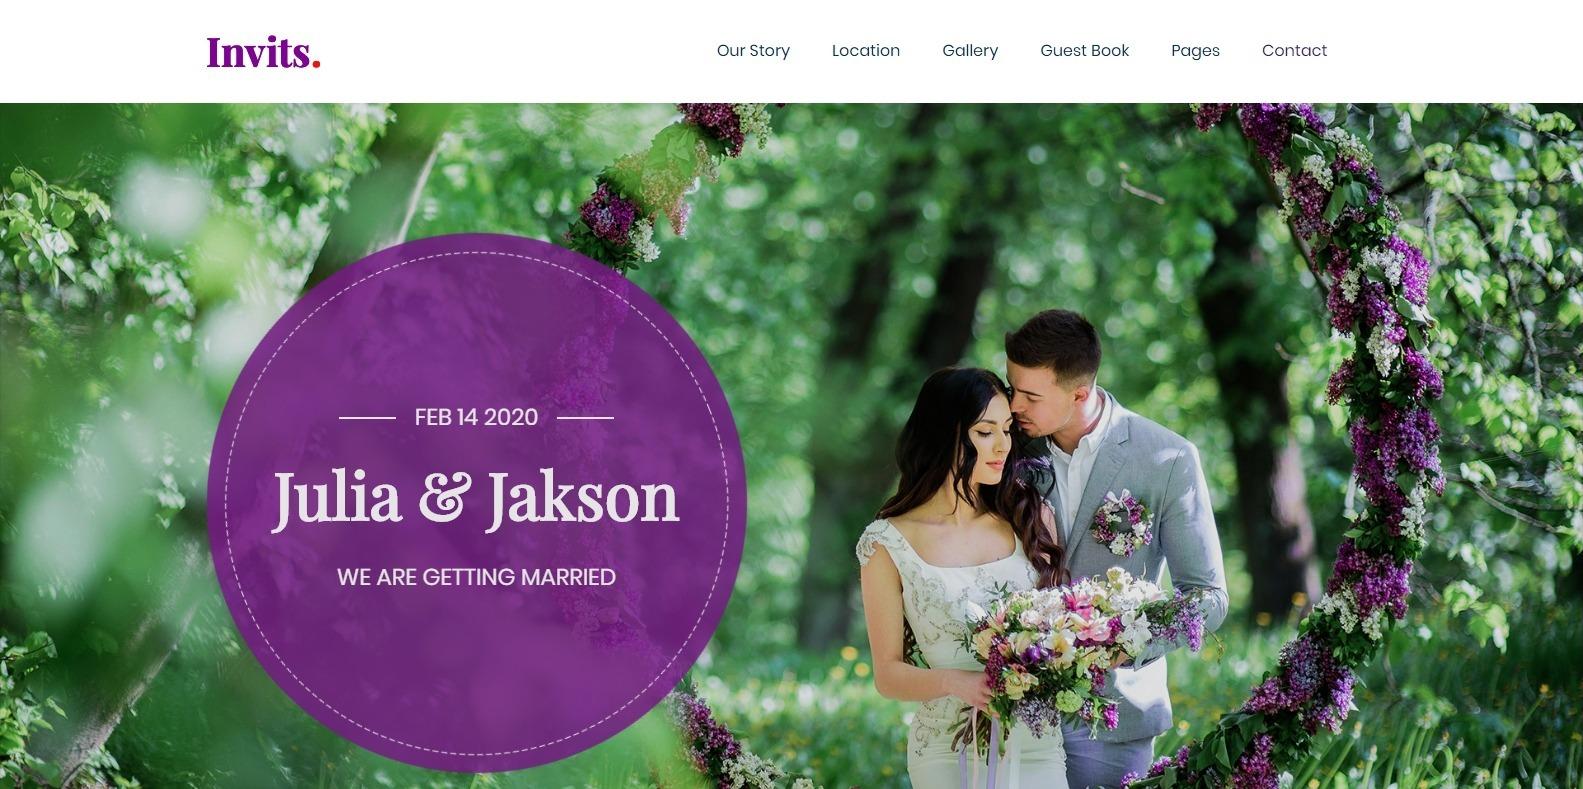 invits-wedding-website-template